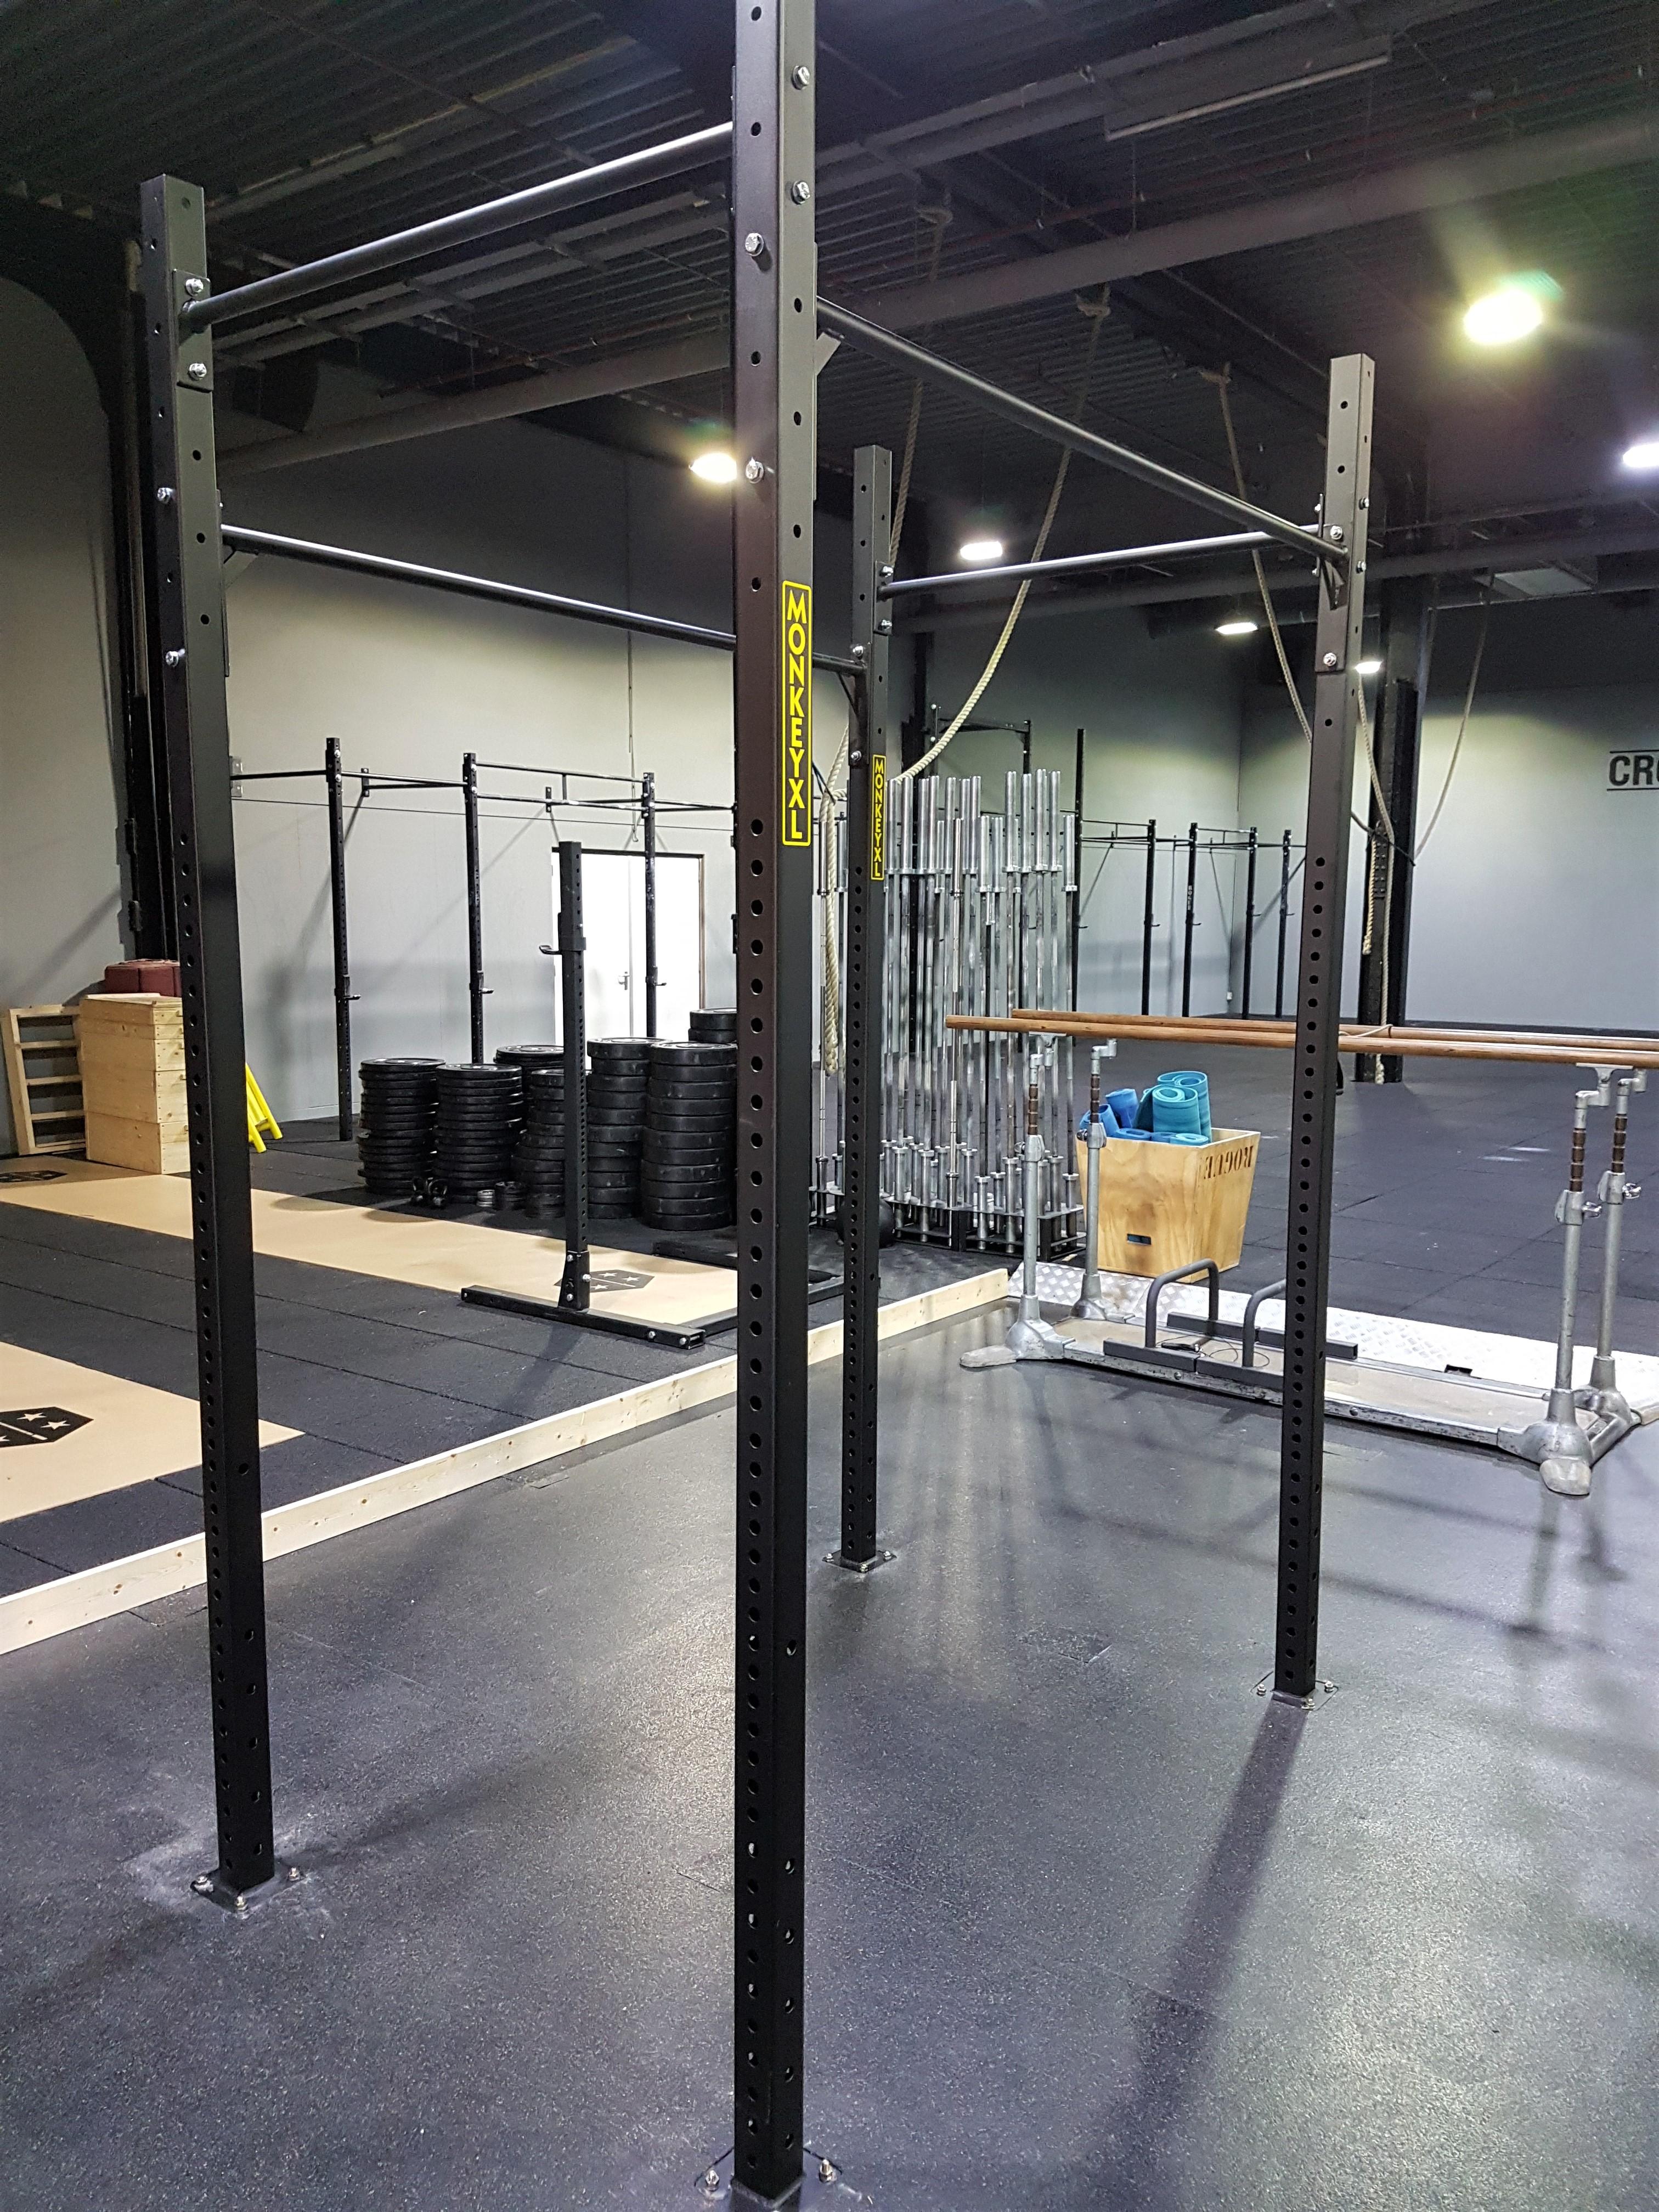 Rig CrossFit Fitness MXL007